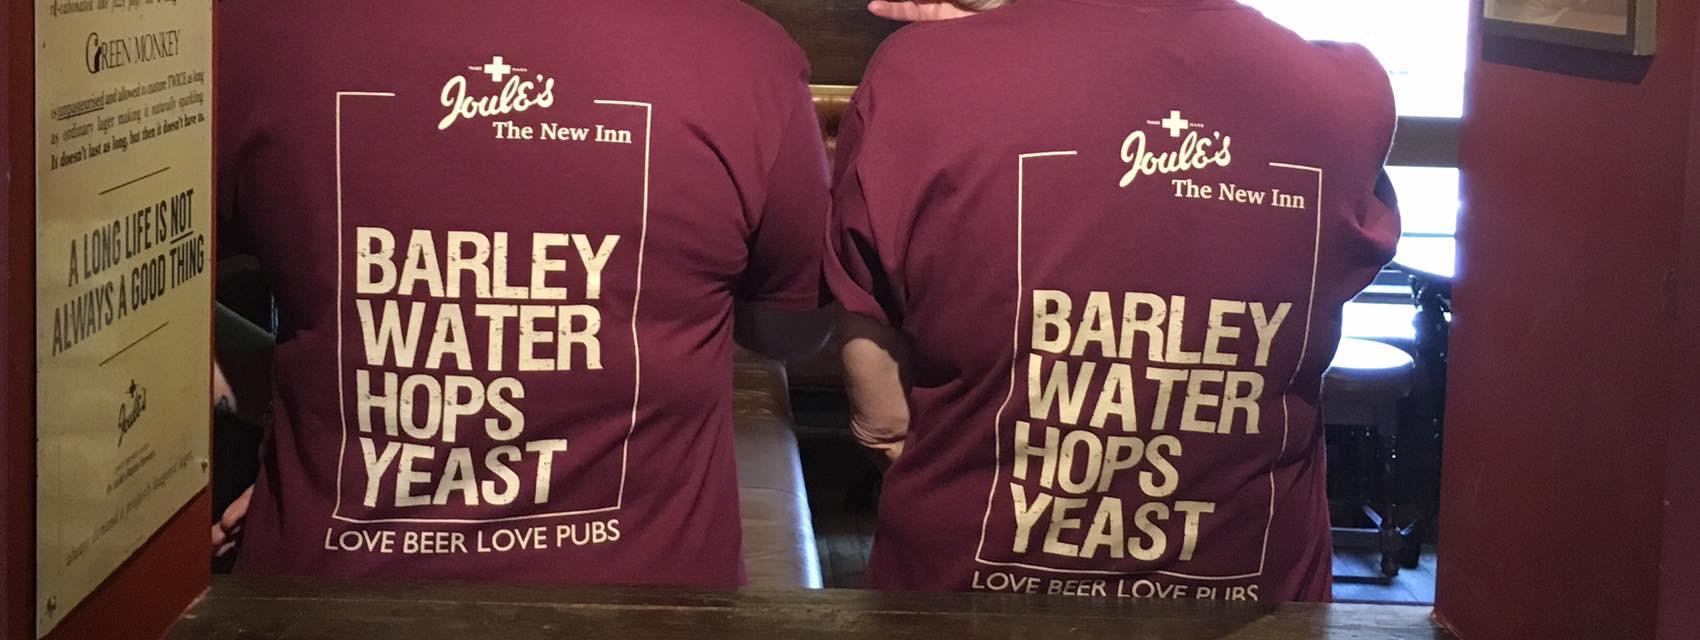 The team t-shirts